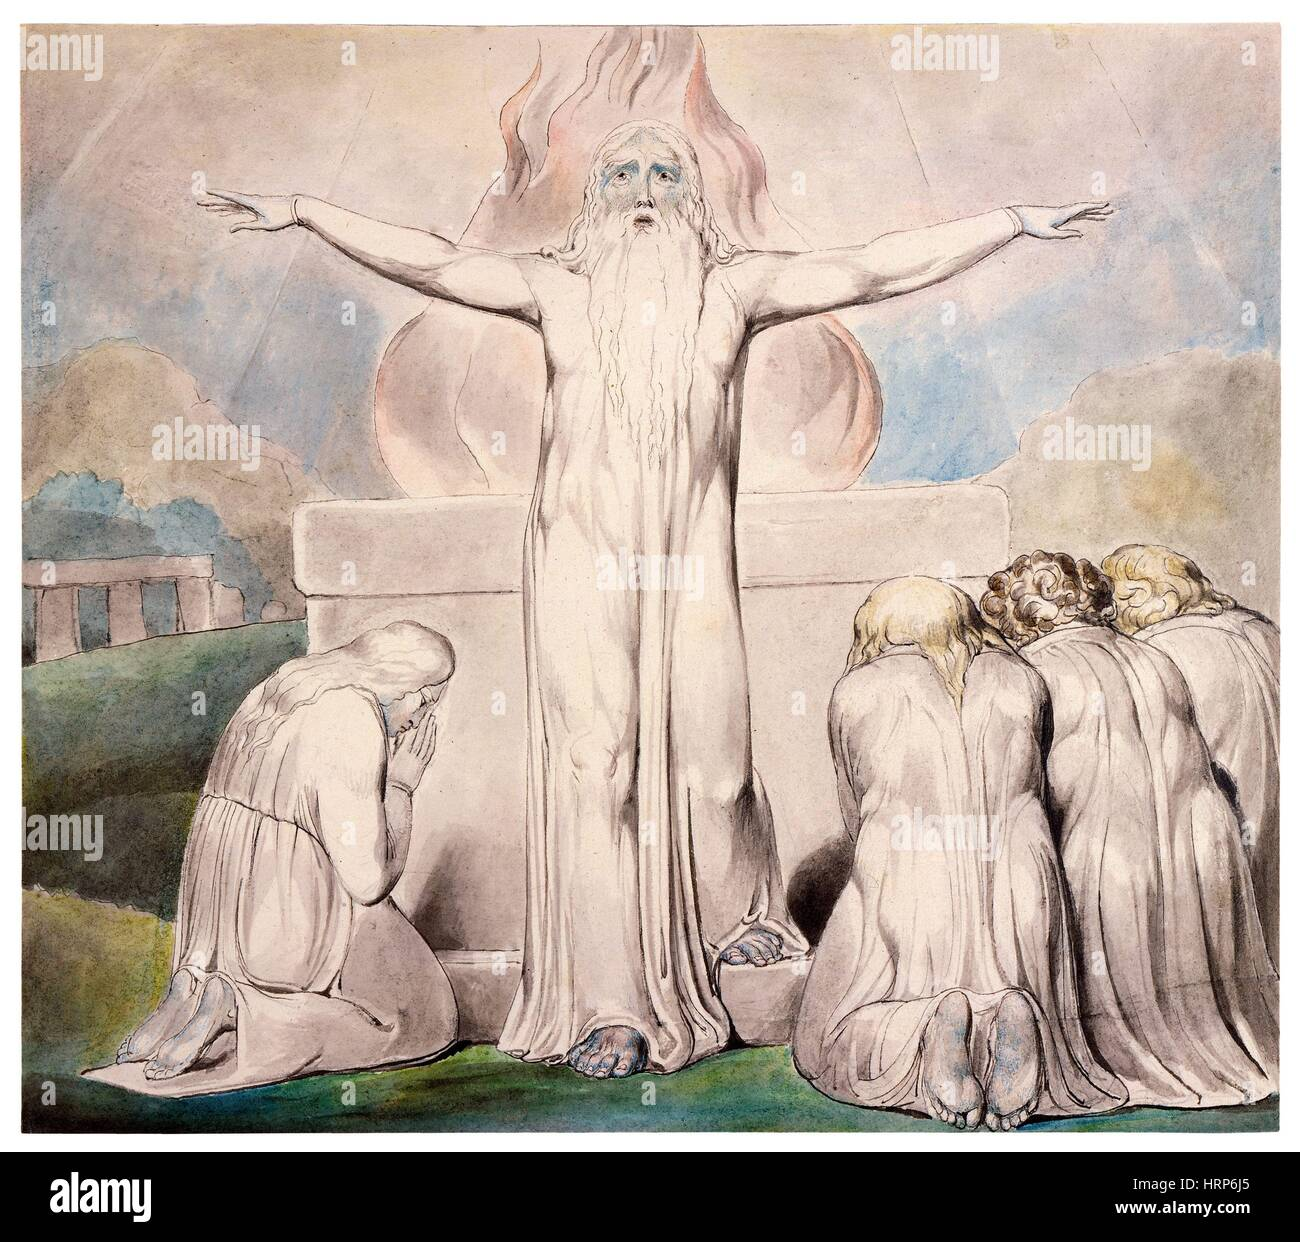 William Blake's 'Job's Sacrifice' - Stock Image